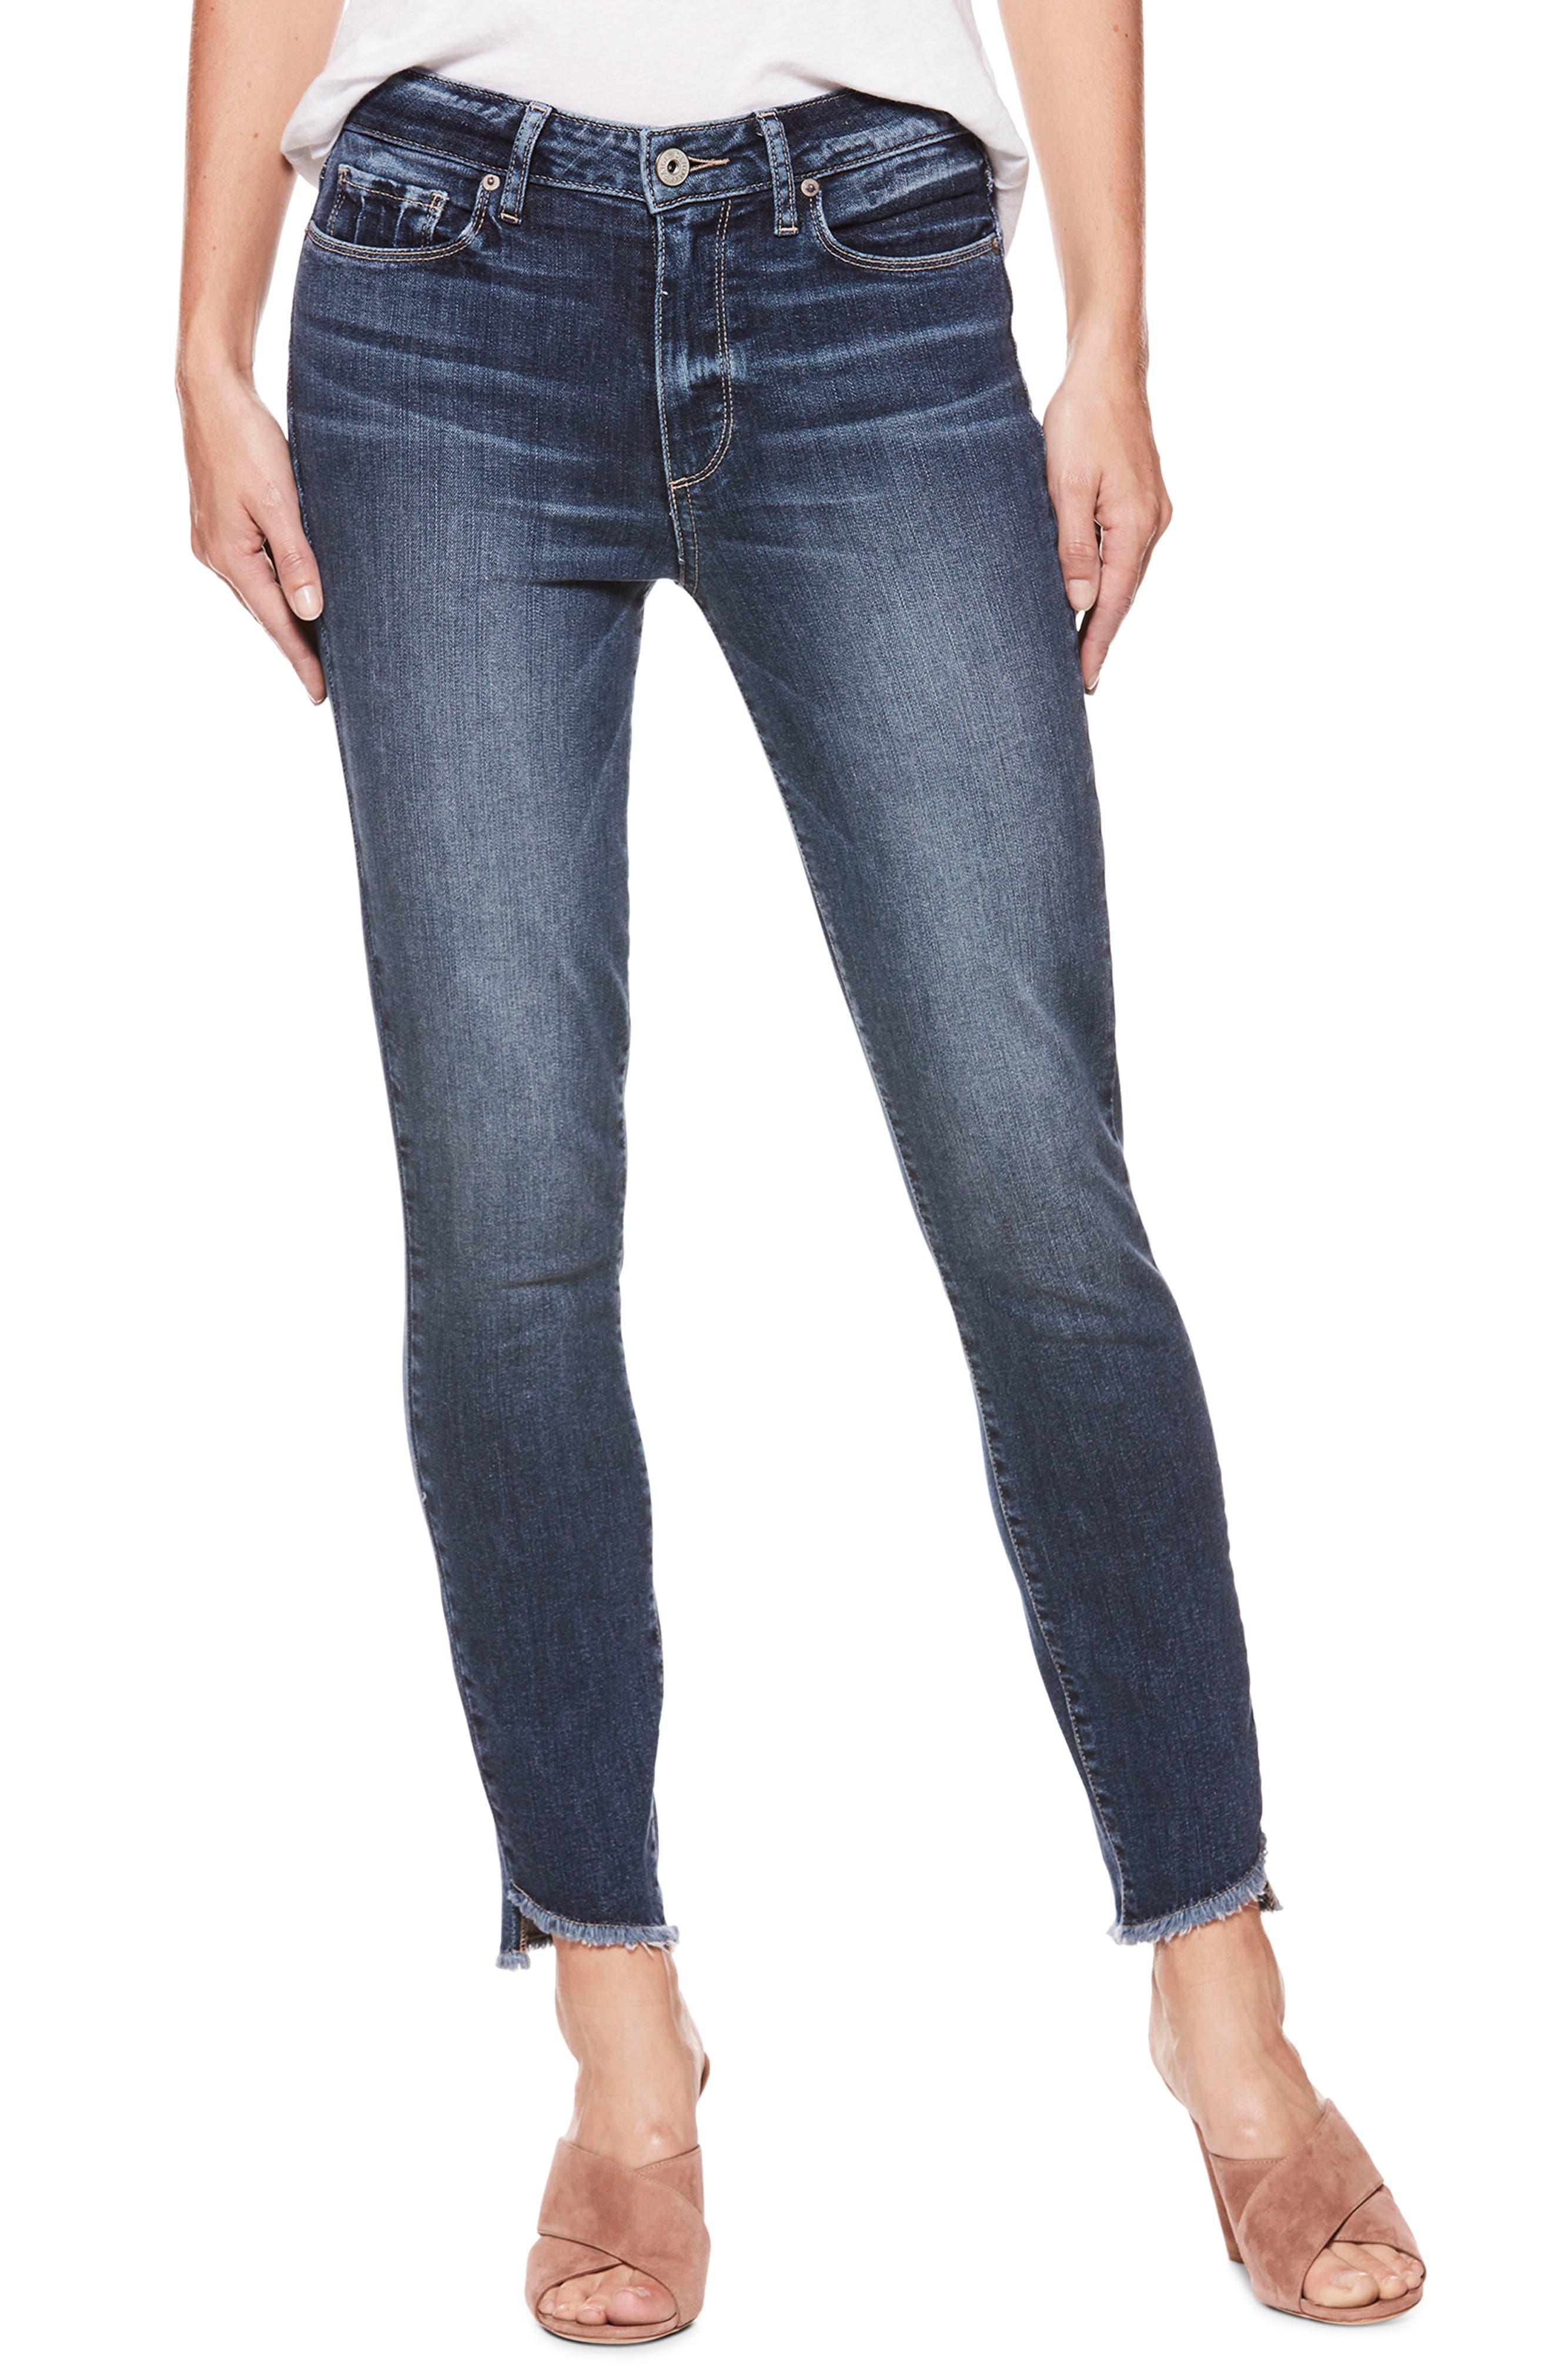 Hoxton High Waist Ankle Skinny Jeans,                             Main thumbnail 1, color,                             Blue